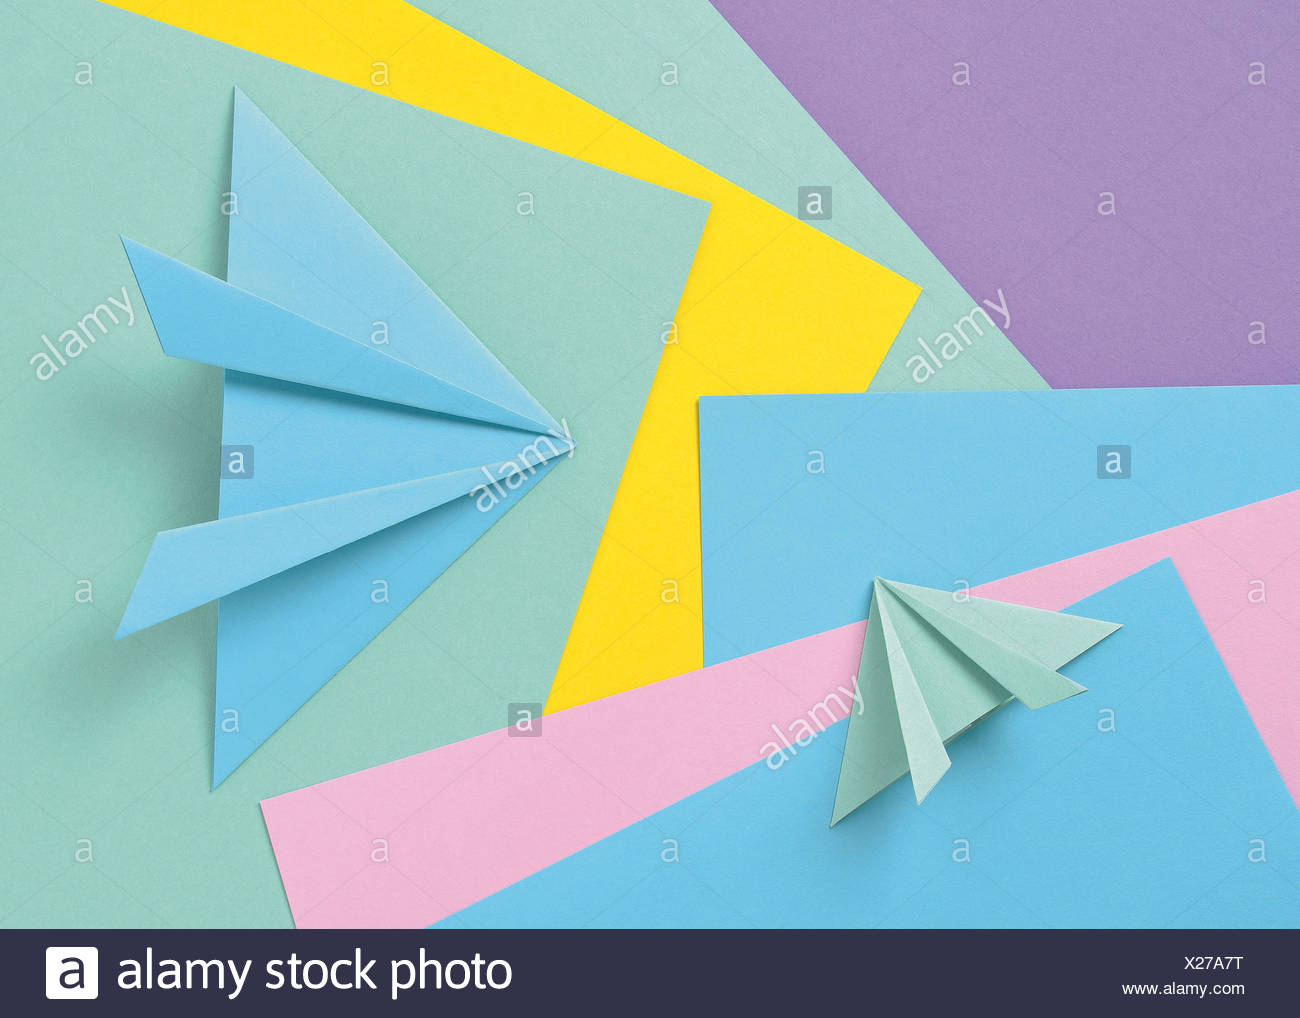 Farbiges Papier origami Stockbild